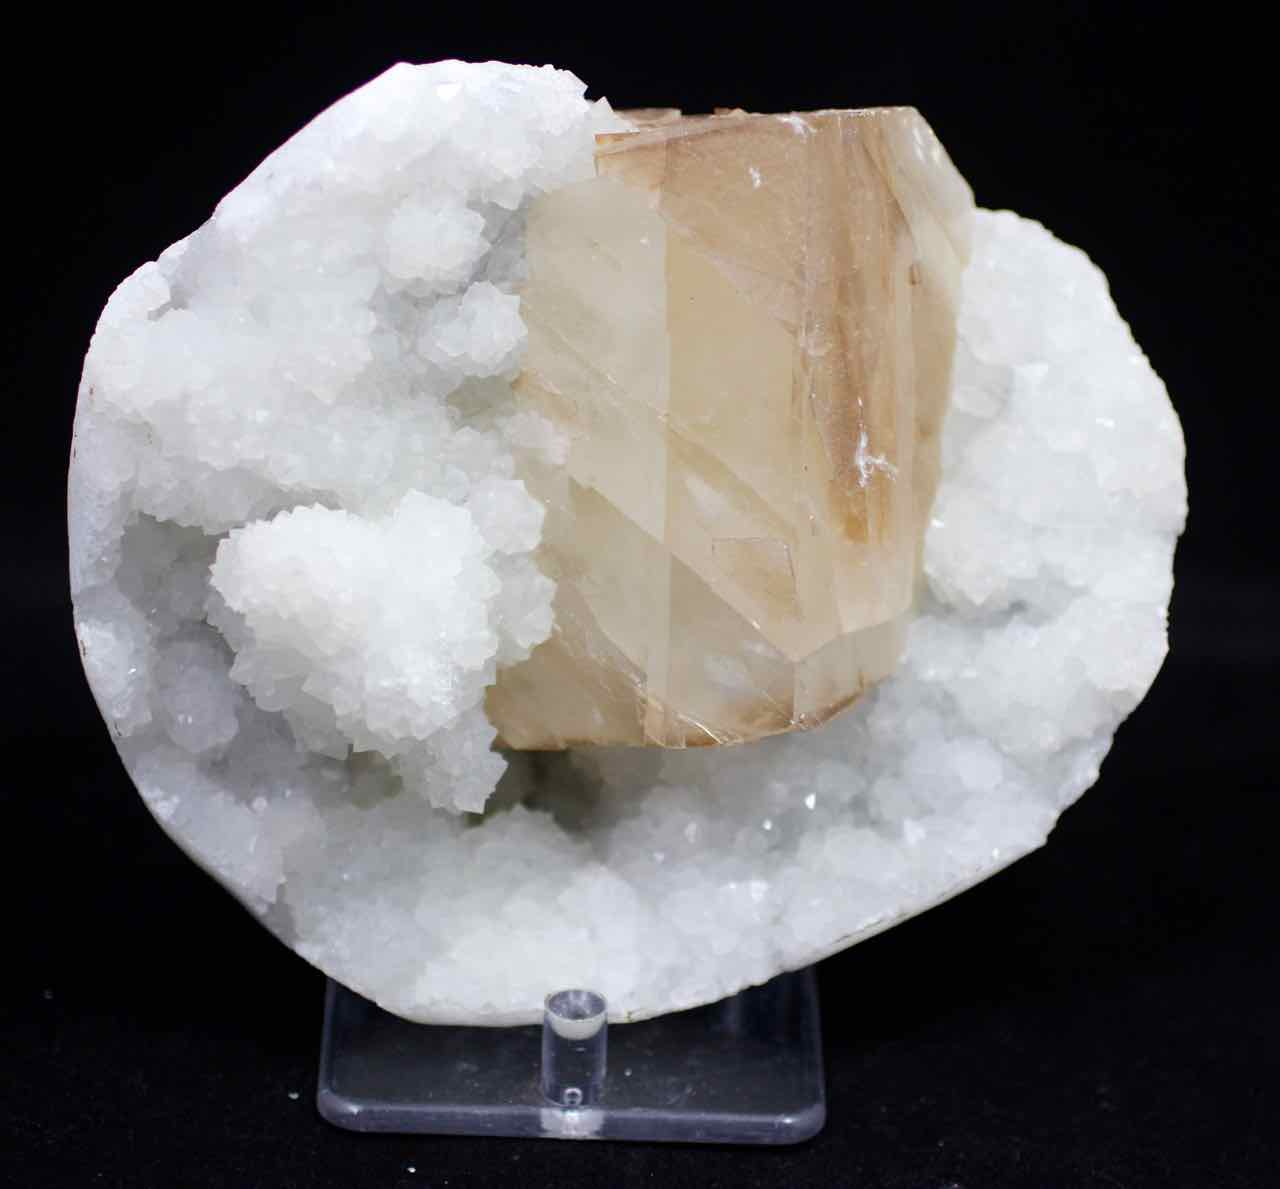 Calcite, Yellow Calcite, Chalcedony, Quartz, Matrix, Zeolite, Minerals, Natural Stone, Rock, Natural Crystal, Collectible, India, Earth